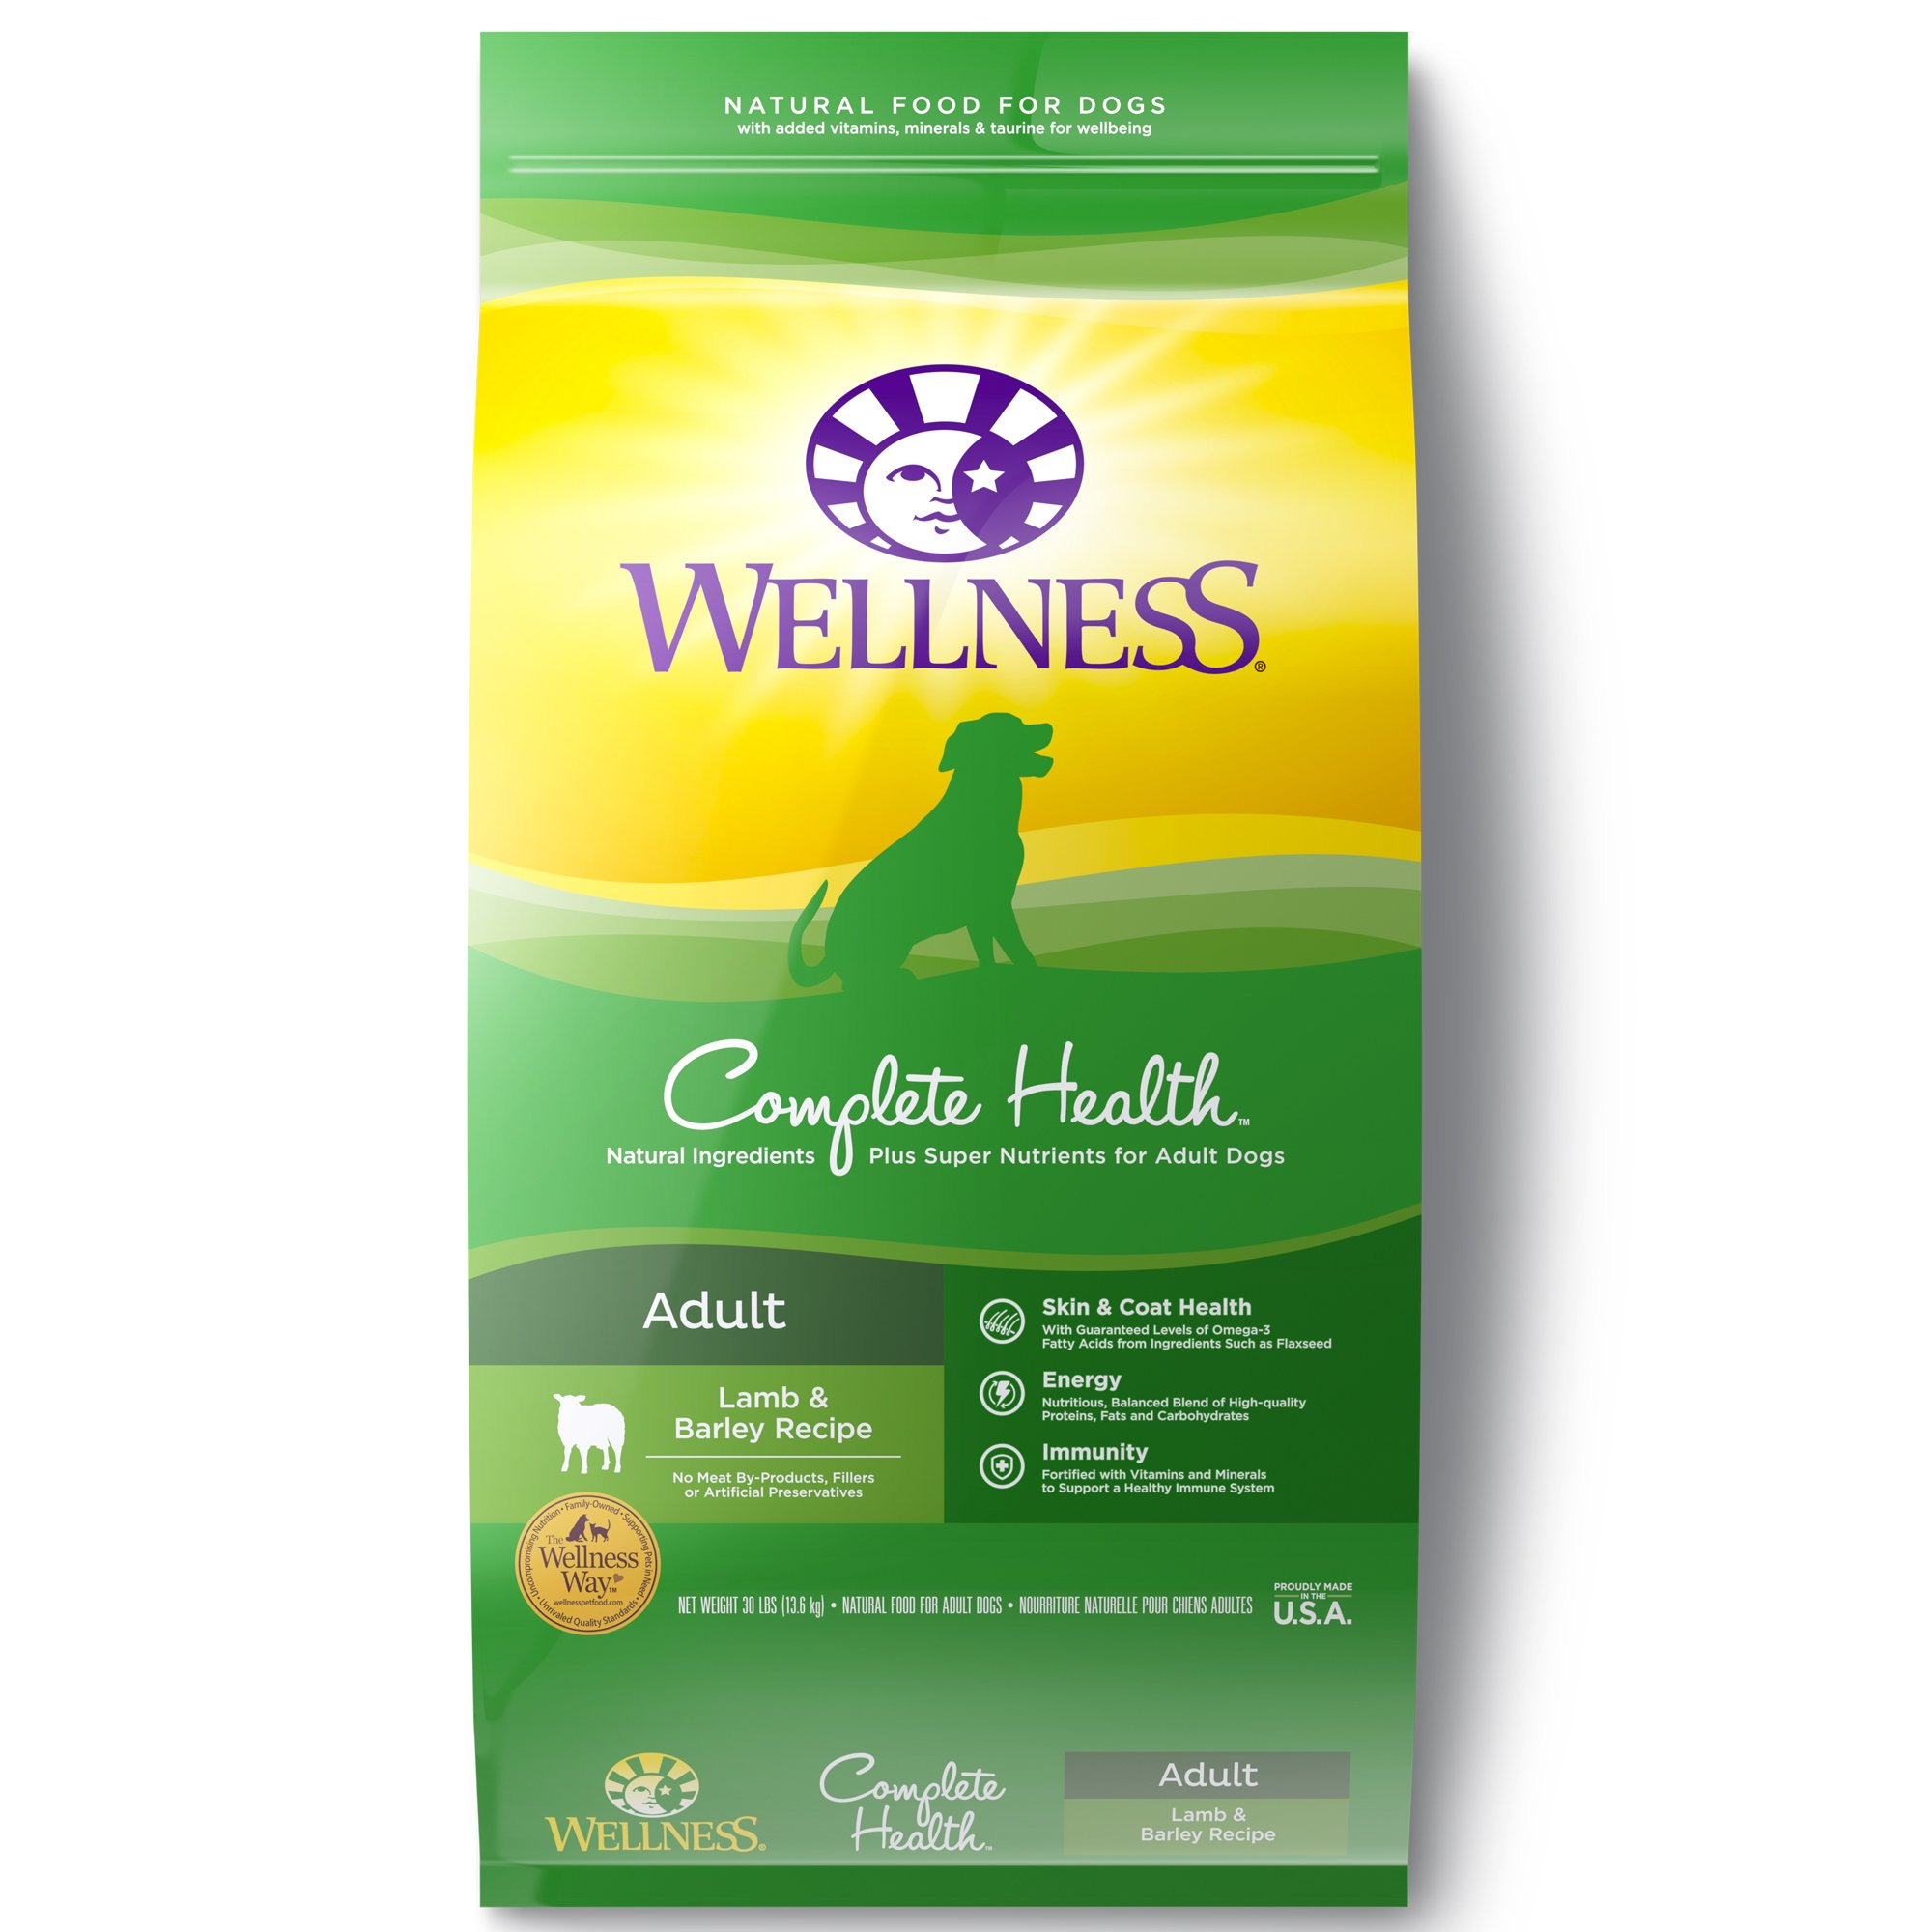 Wellness Complete Health Natural Dry Dog Food, Lamb & Barley, 30-Pound Bag by Wellness Natural Pet Food